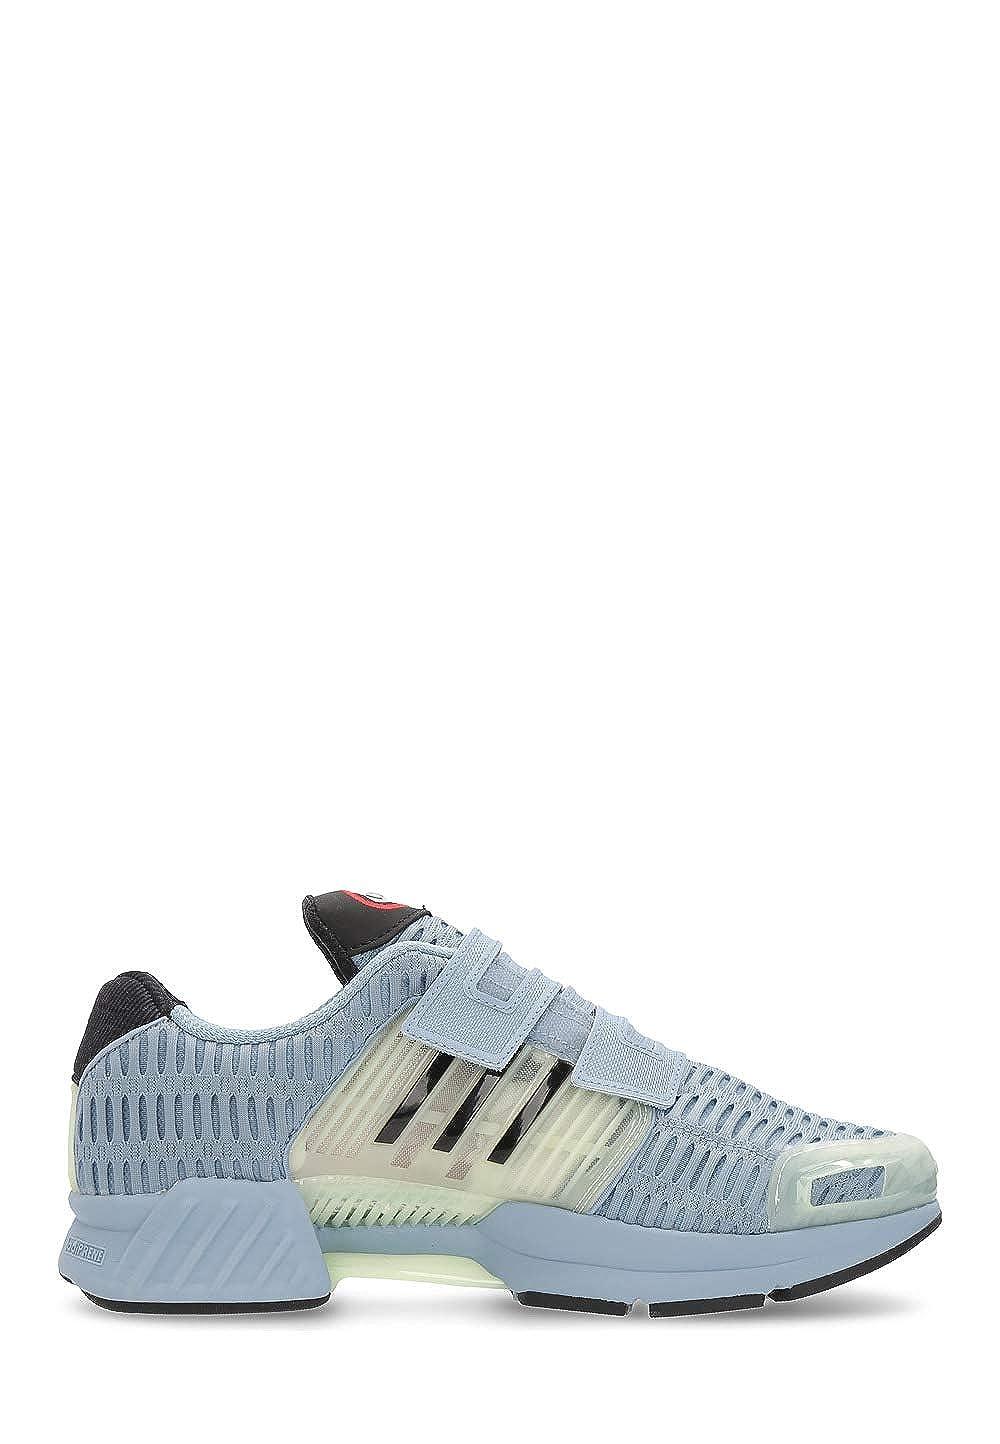 Adidas Clima Cool 1 CMF Light Blau Blau Light 43c4ae